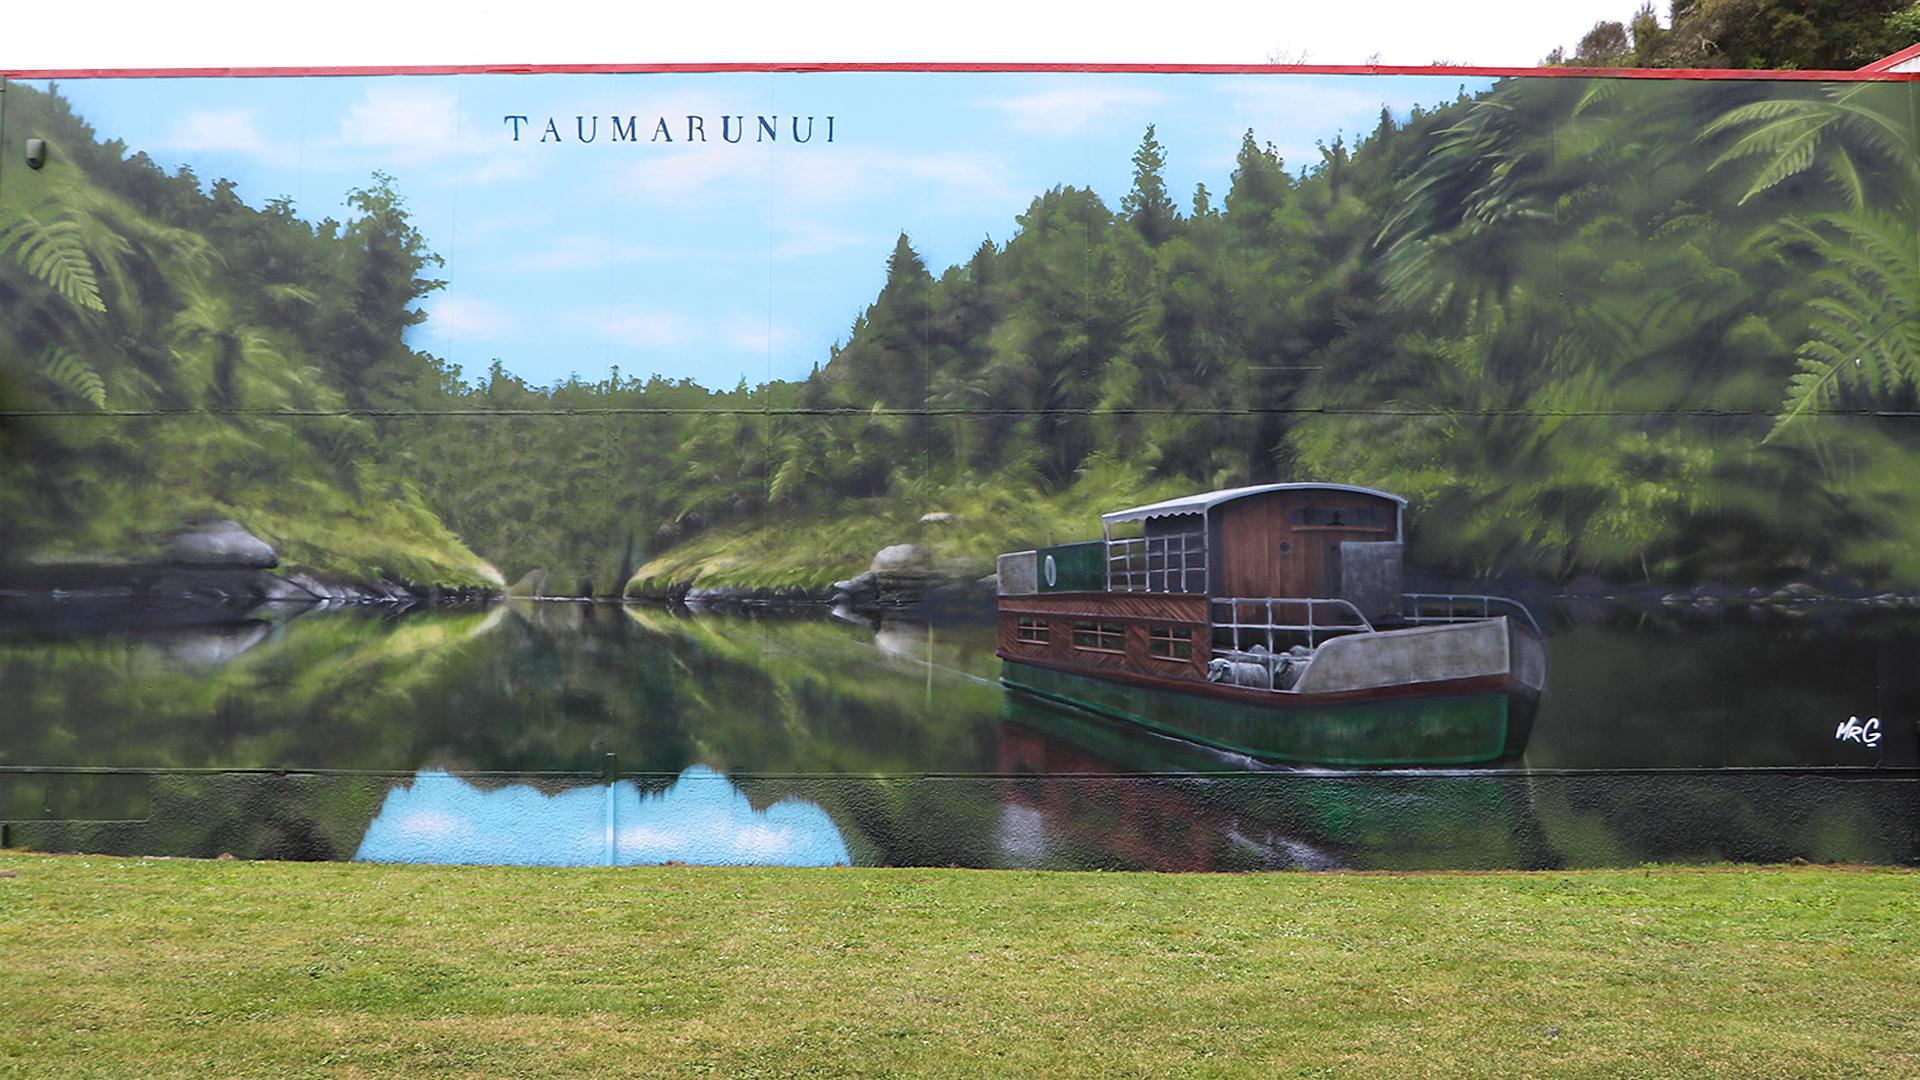 FAR_06328_Heart_Of_The_Community_Taumarunui.jpg